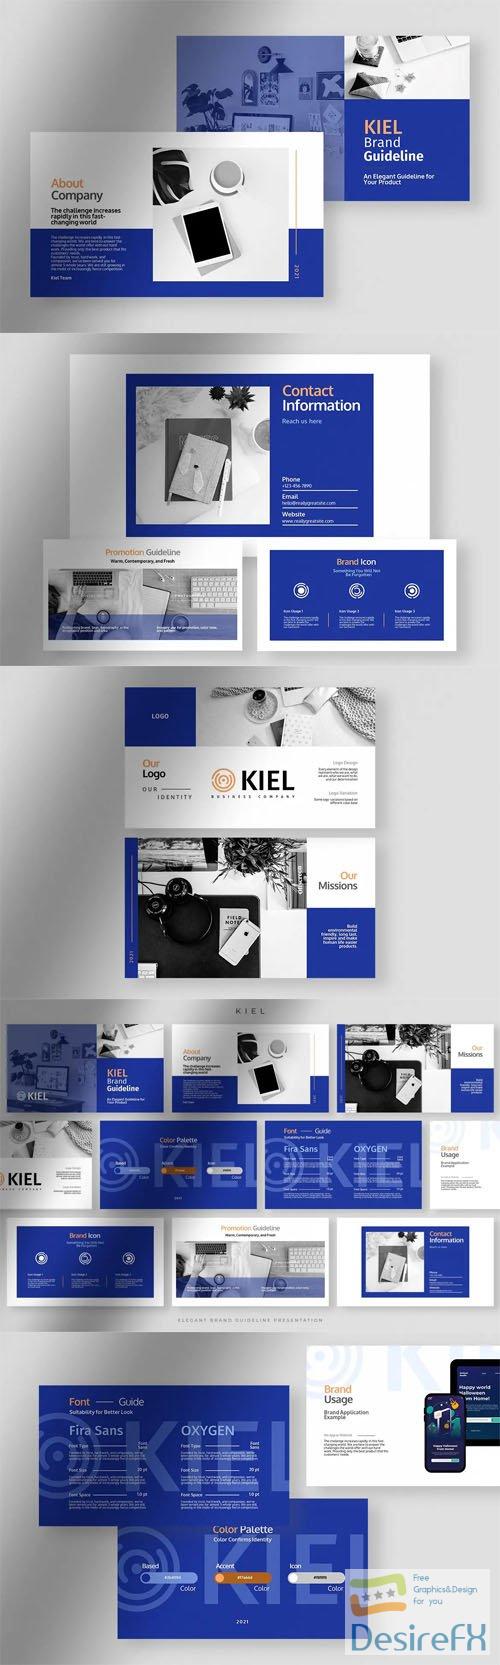 Kiel Brand Guideline Presentation Powerpoint Template